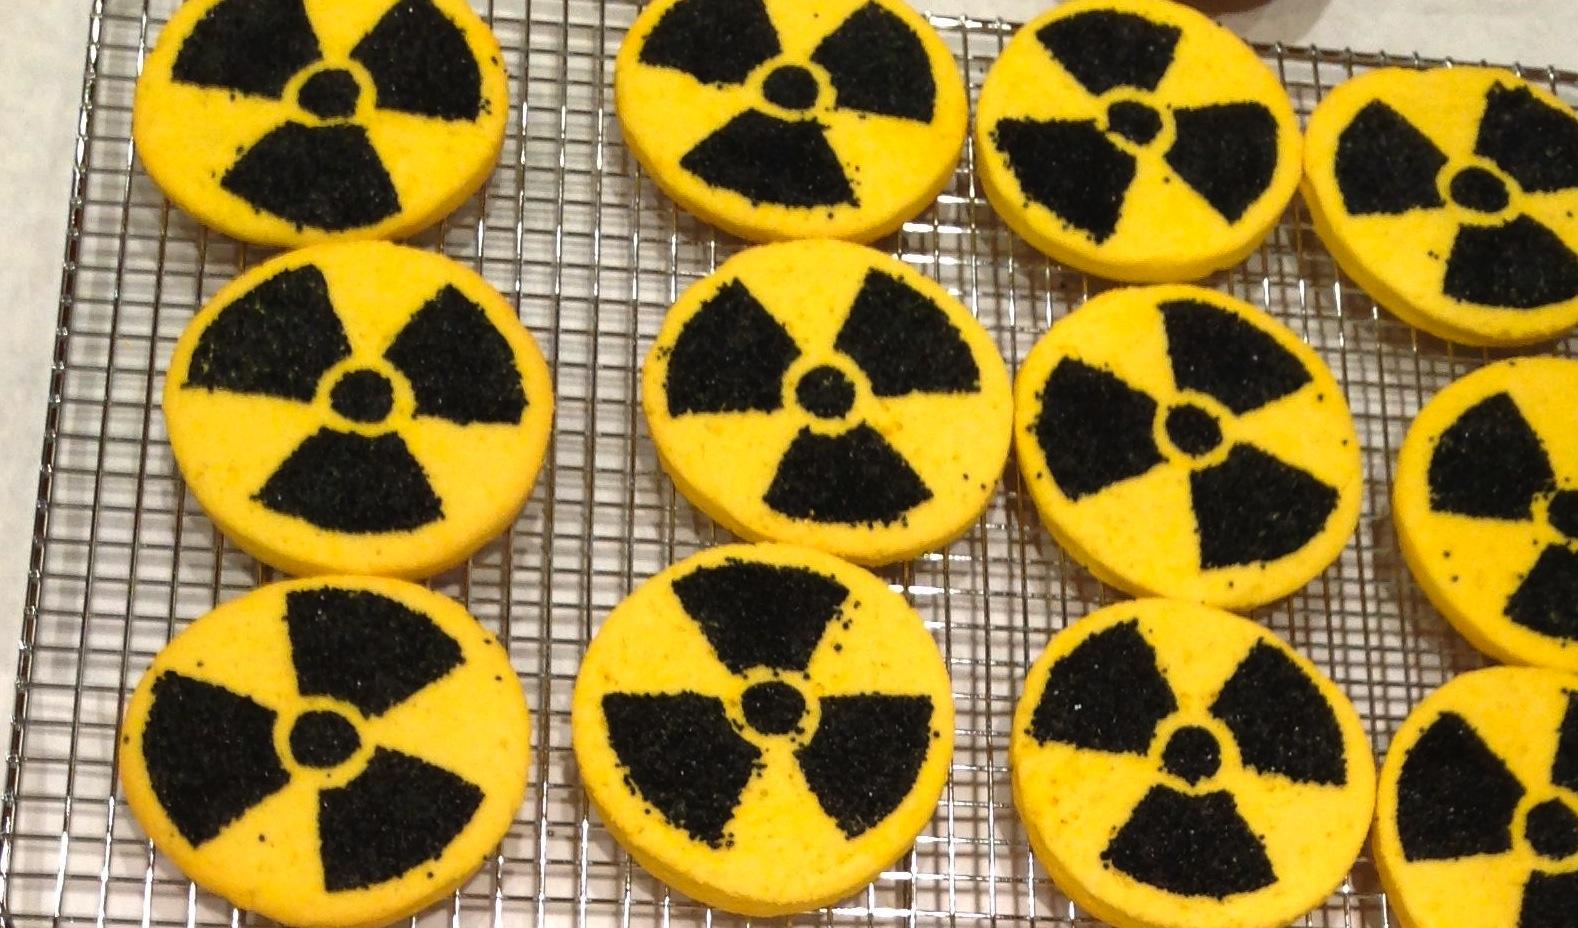 Radioactive cookies